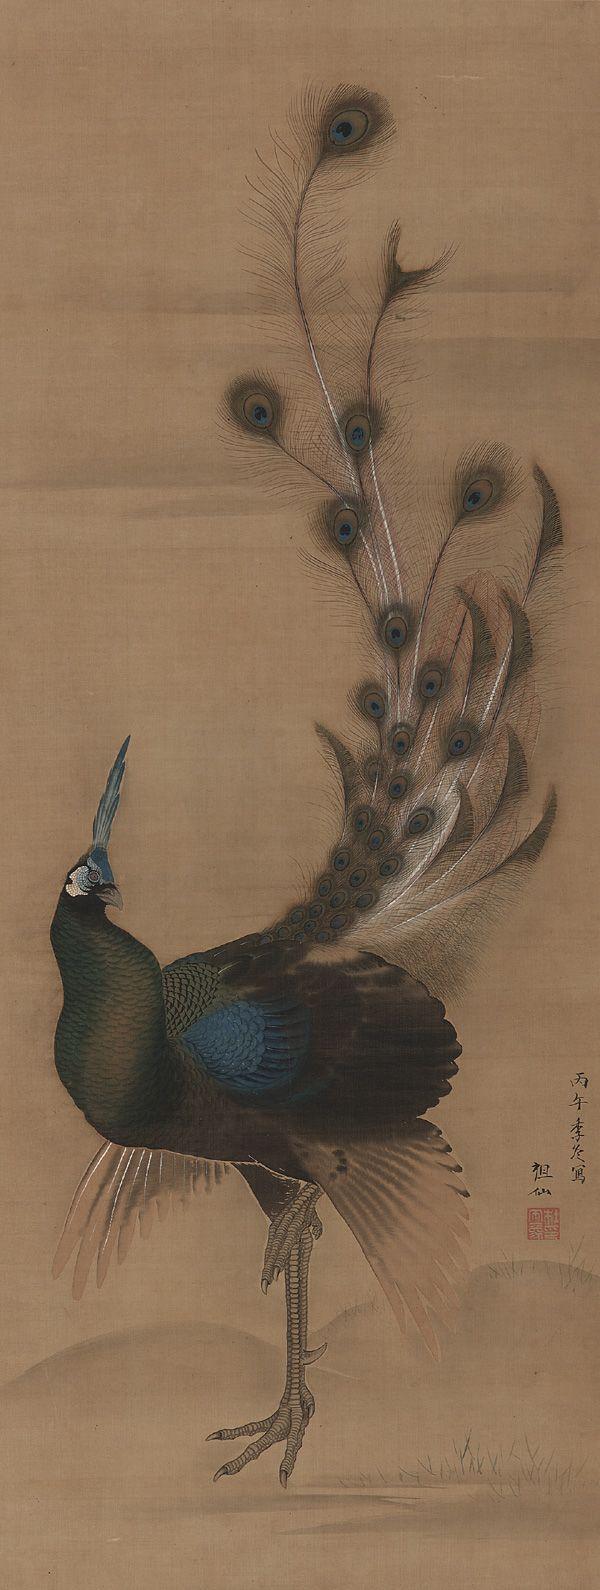 MORI Sosen(森 狙仙/祖仙 Japanese, 1747-1821)    A Peacock 孔雀図 late 18th century    Color and ink on silk